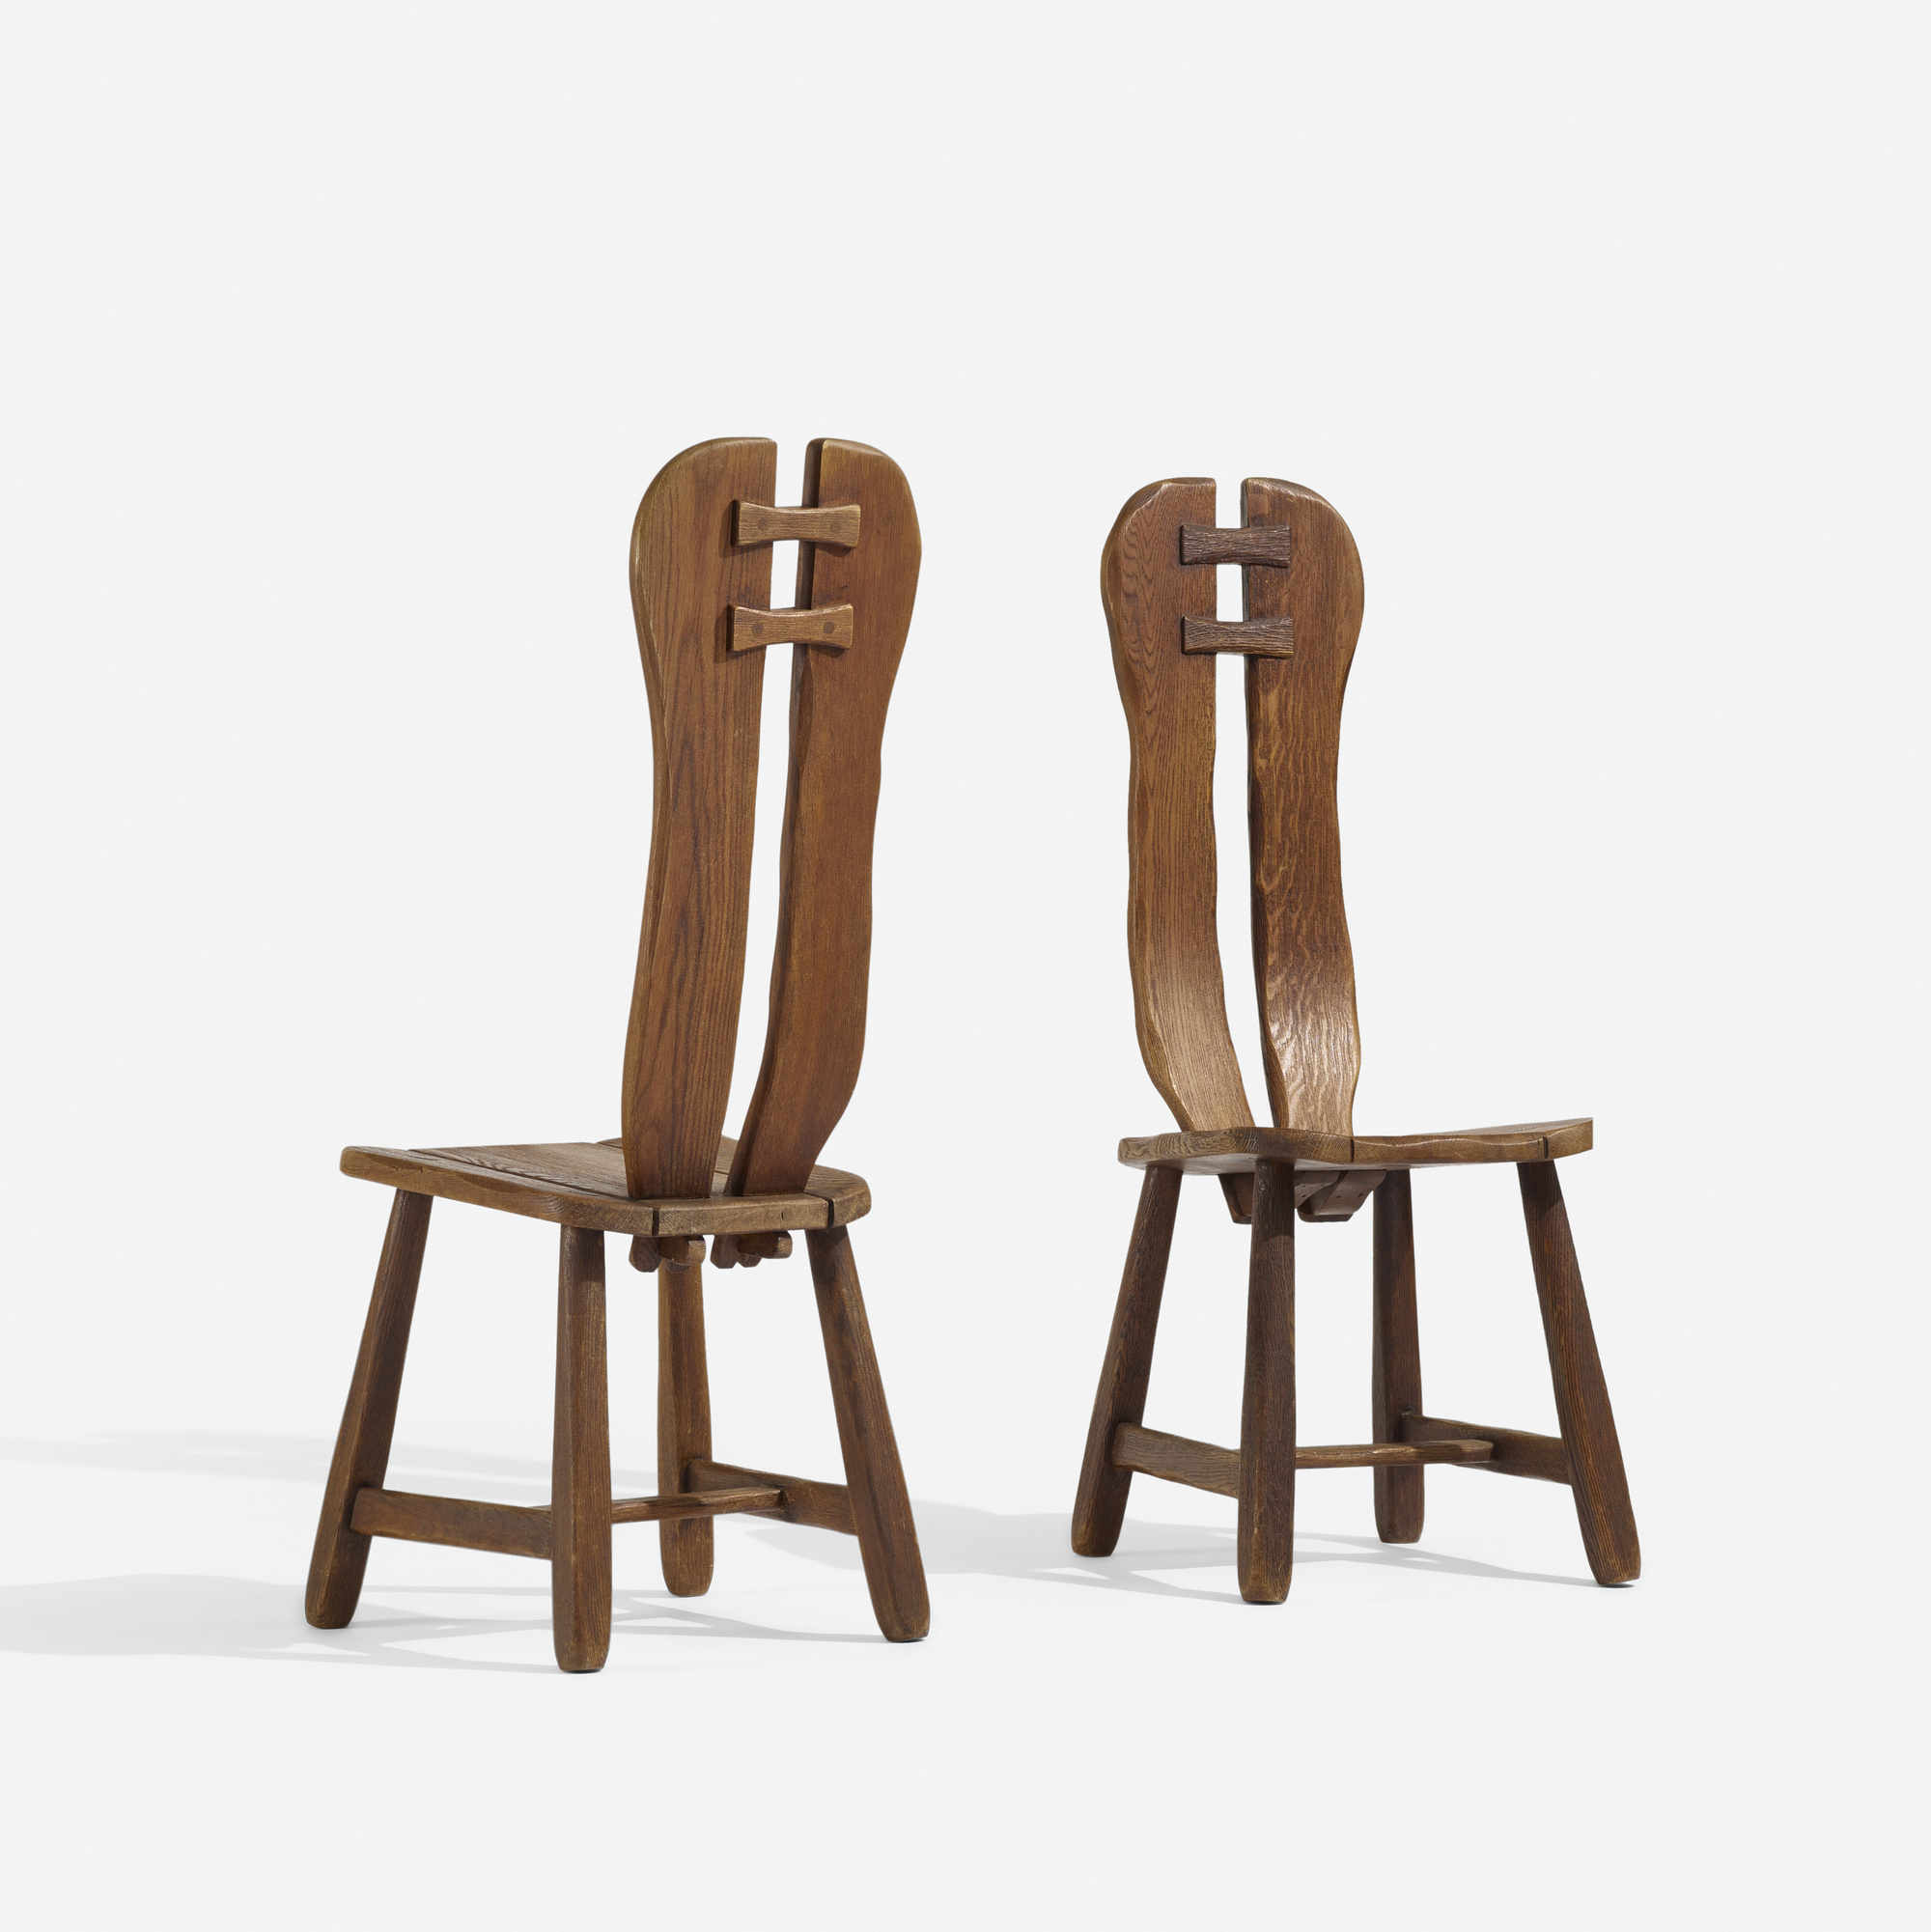 165: Swedish / chairs, pair (1 of 3)